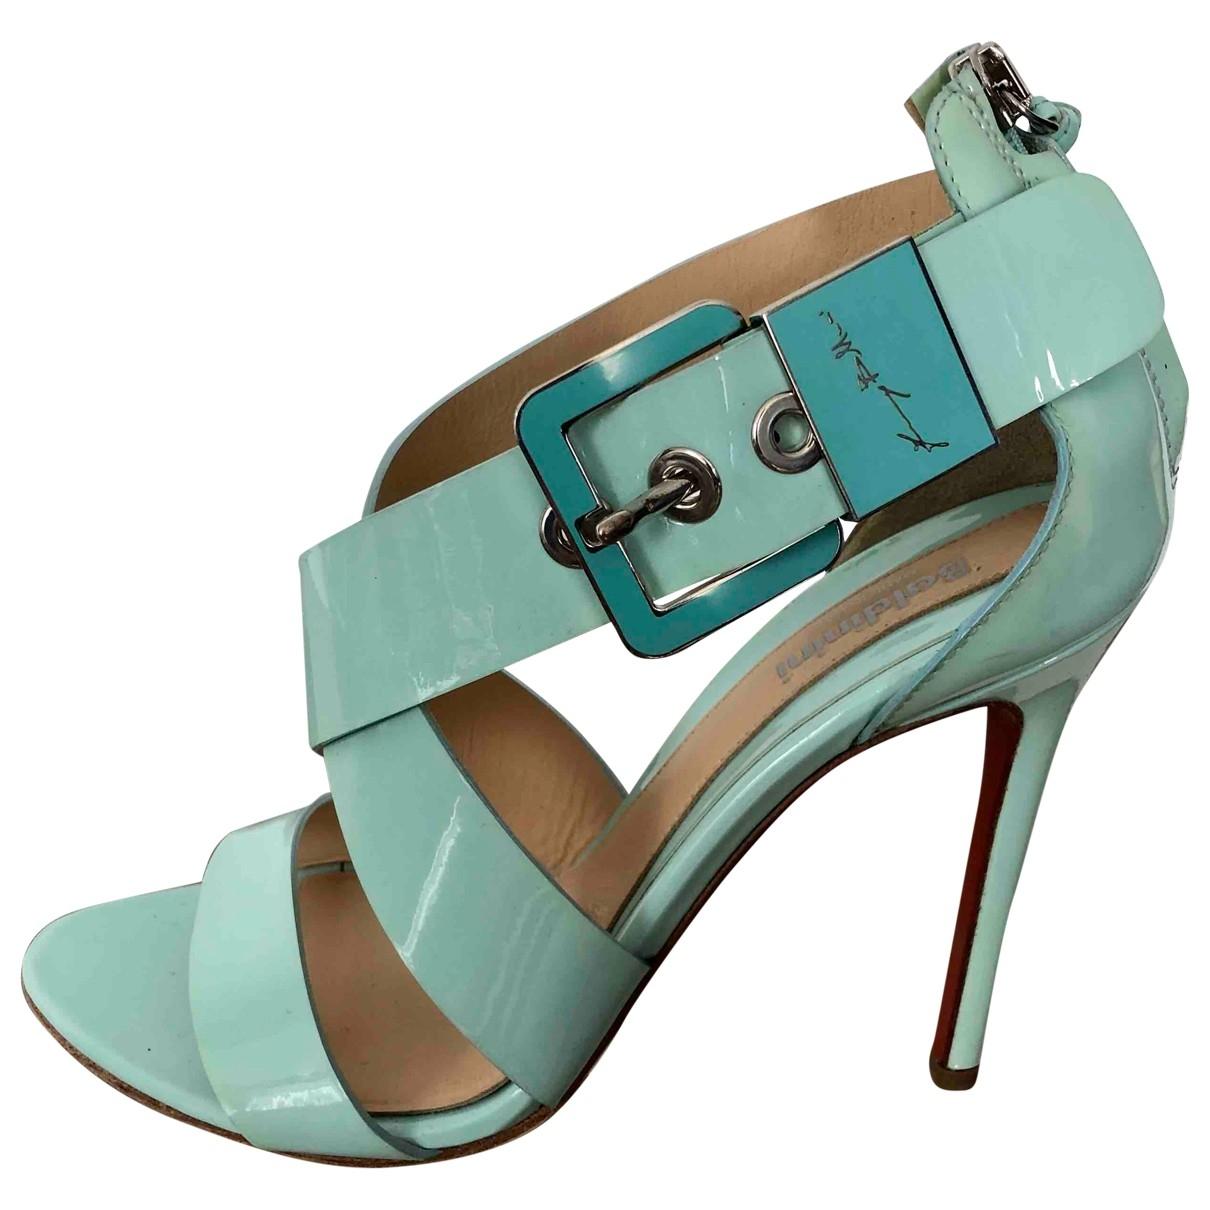 Baldinini \N Green Patent leather Heels for Women 38 EU